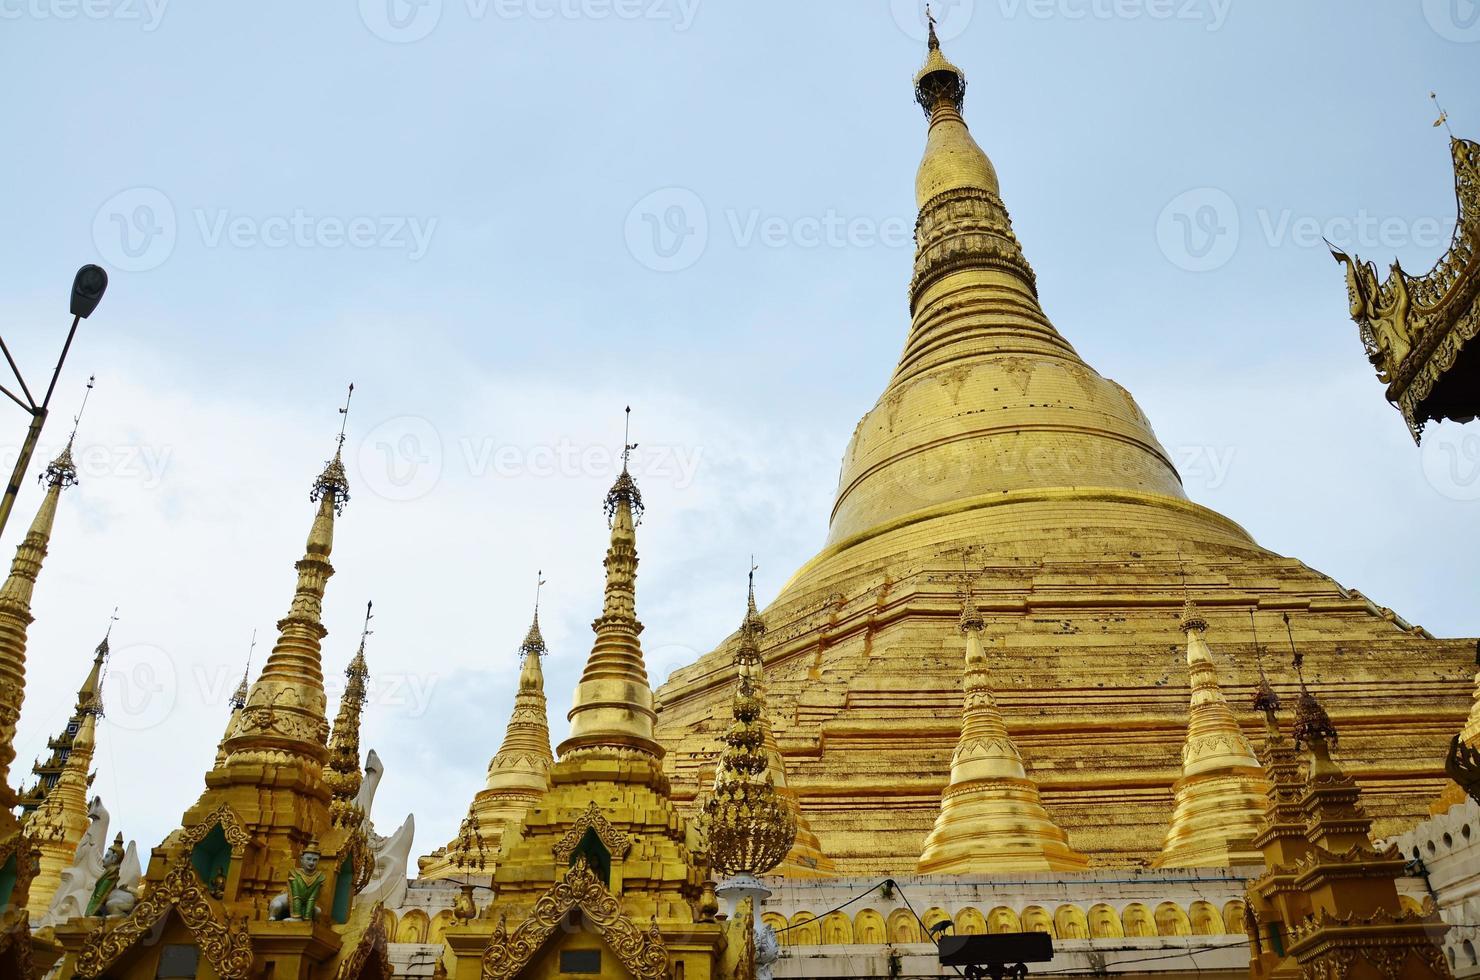 Shwedagon Pagoda or Great Dagon Pagoda located in Yangon, Burma. photo